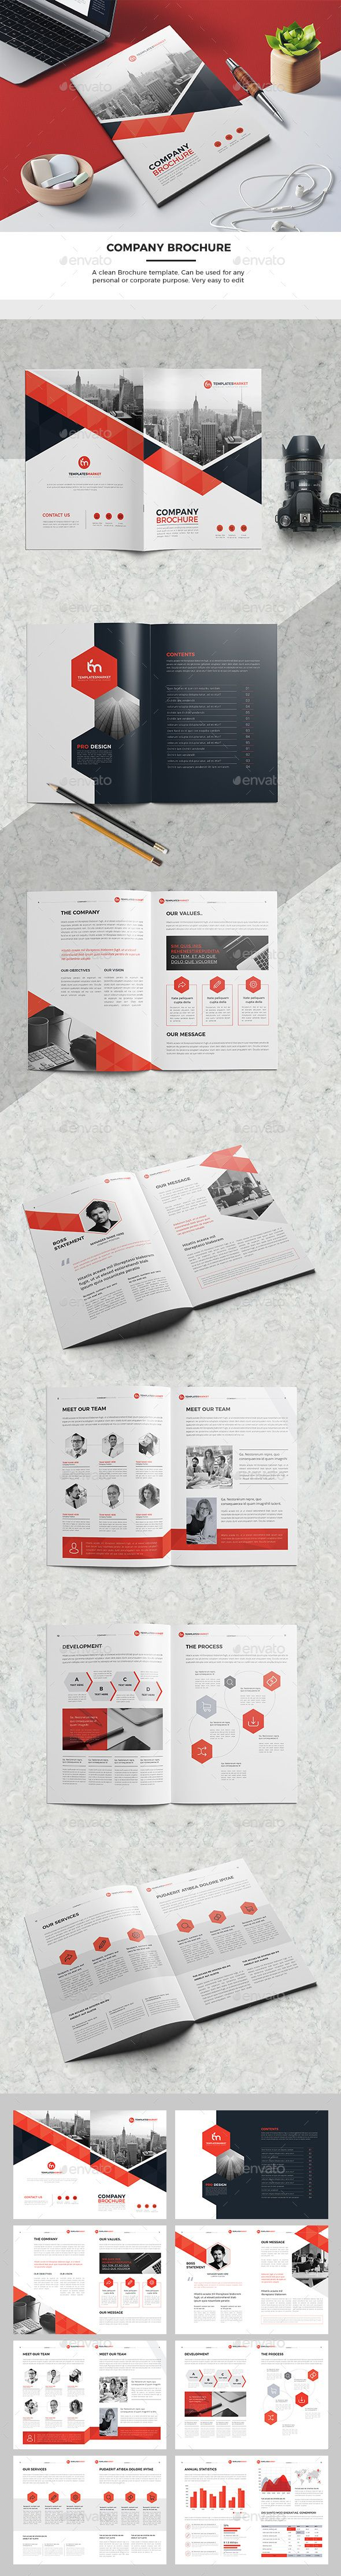 Tm Company Brochure  Brochures Corporate Brochure And Brochure